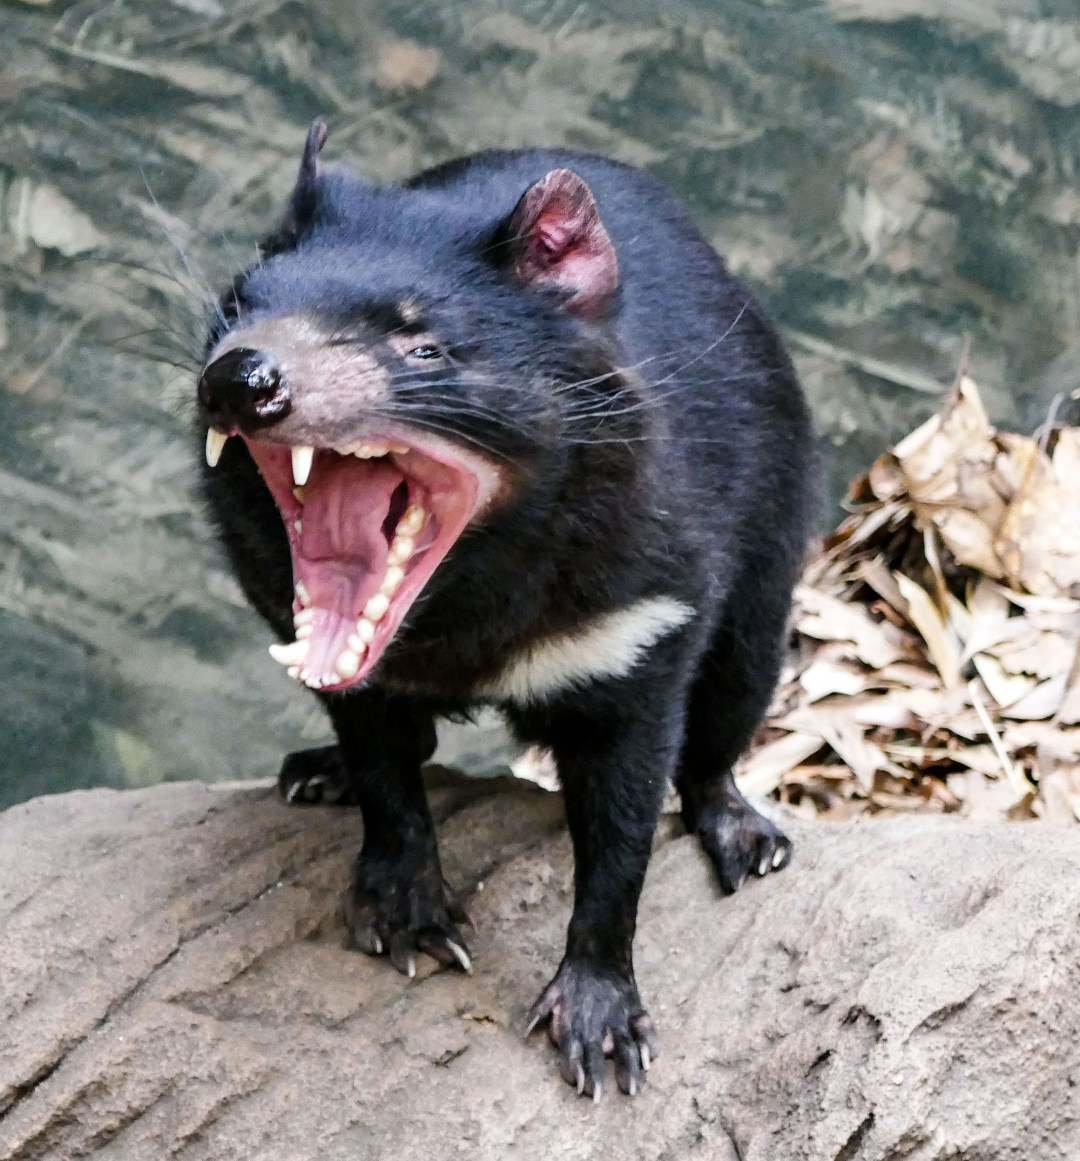 Fierce Tasmanian devil at Sydney Wildlife Zoo for boomervoice